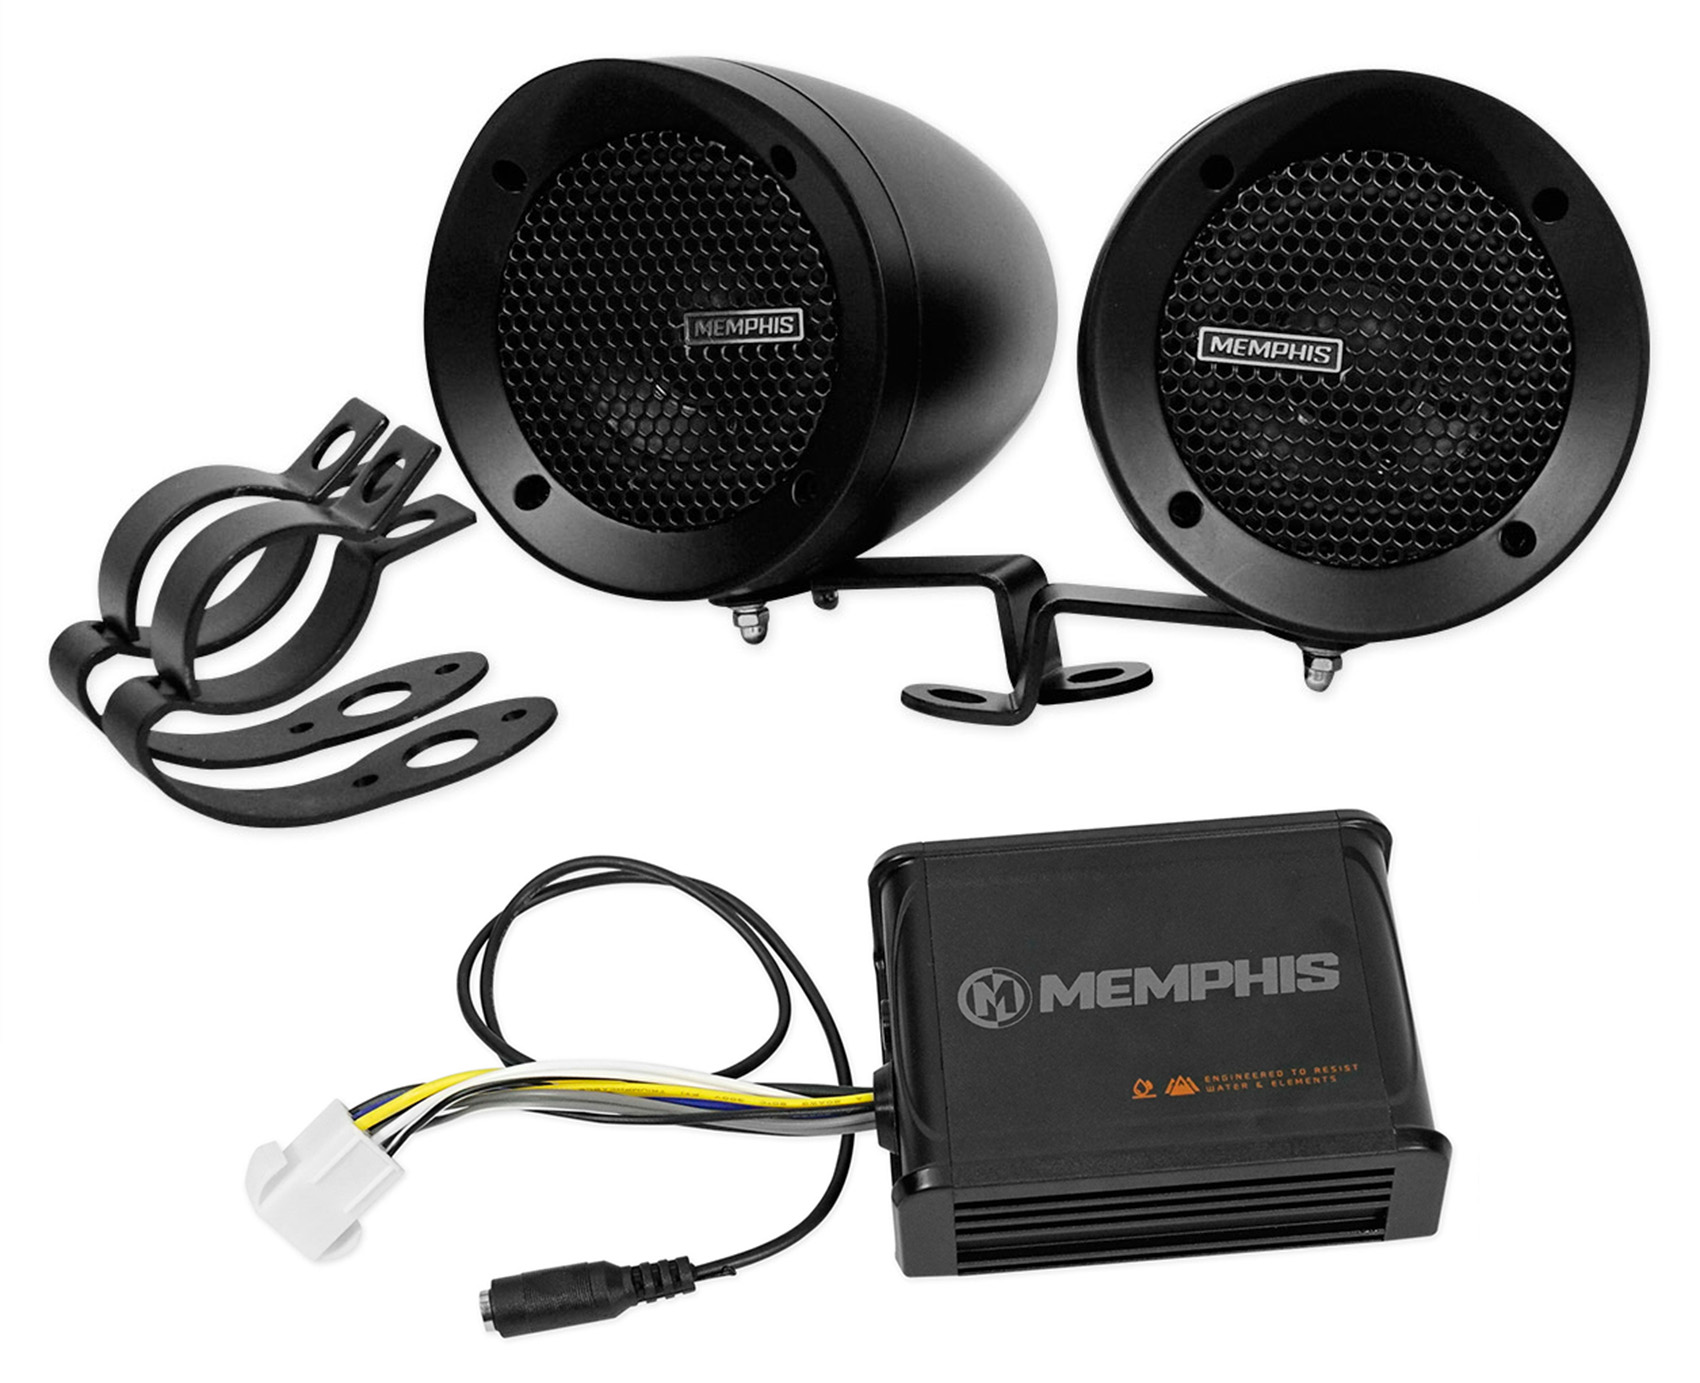 Memphis Audio ATV Audio System w//Handlebar Speakers for Honda Rancher 420